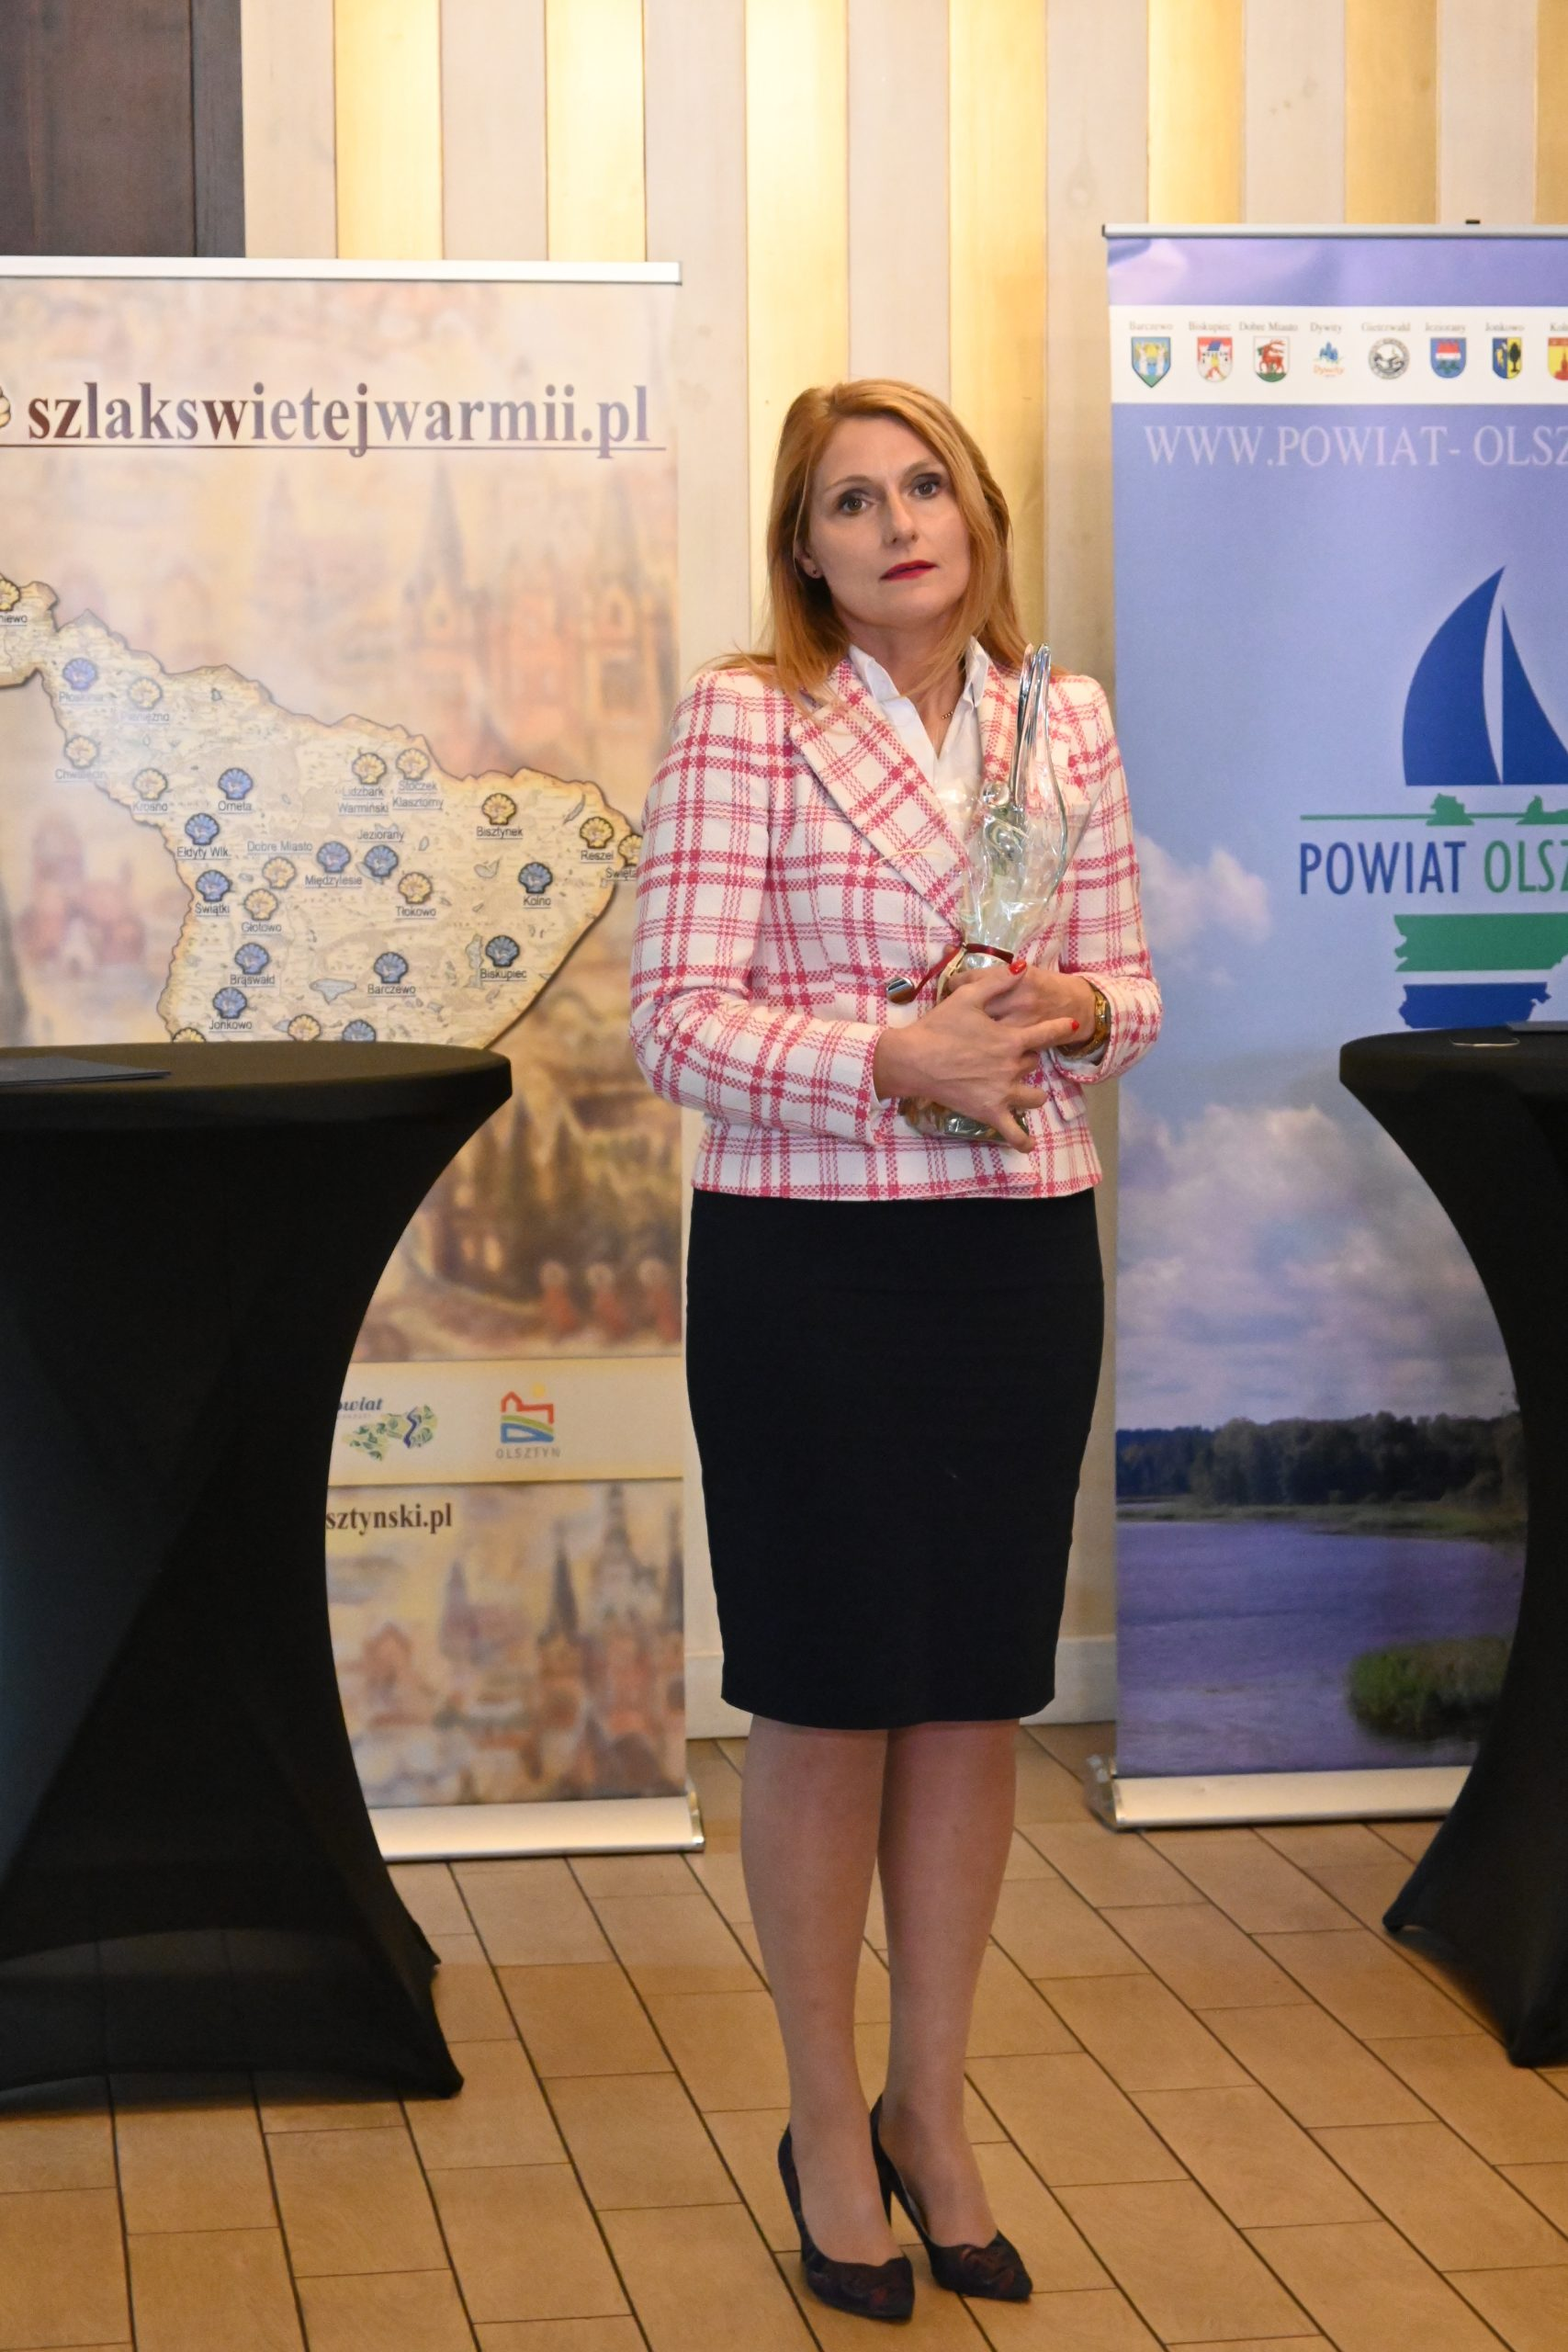 Sylwia Jaskulska